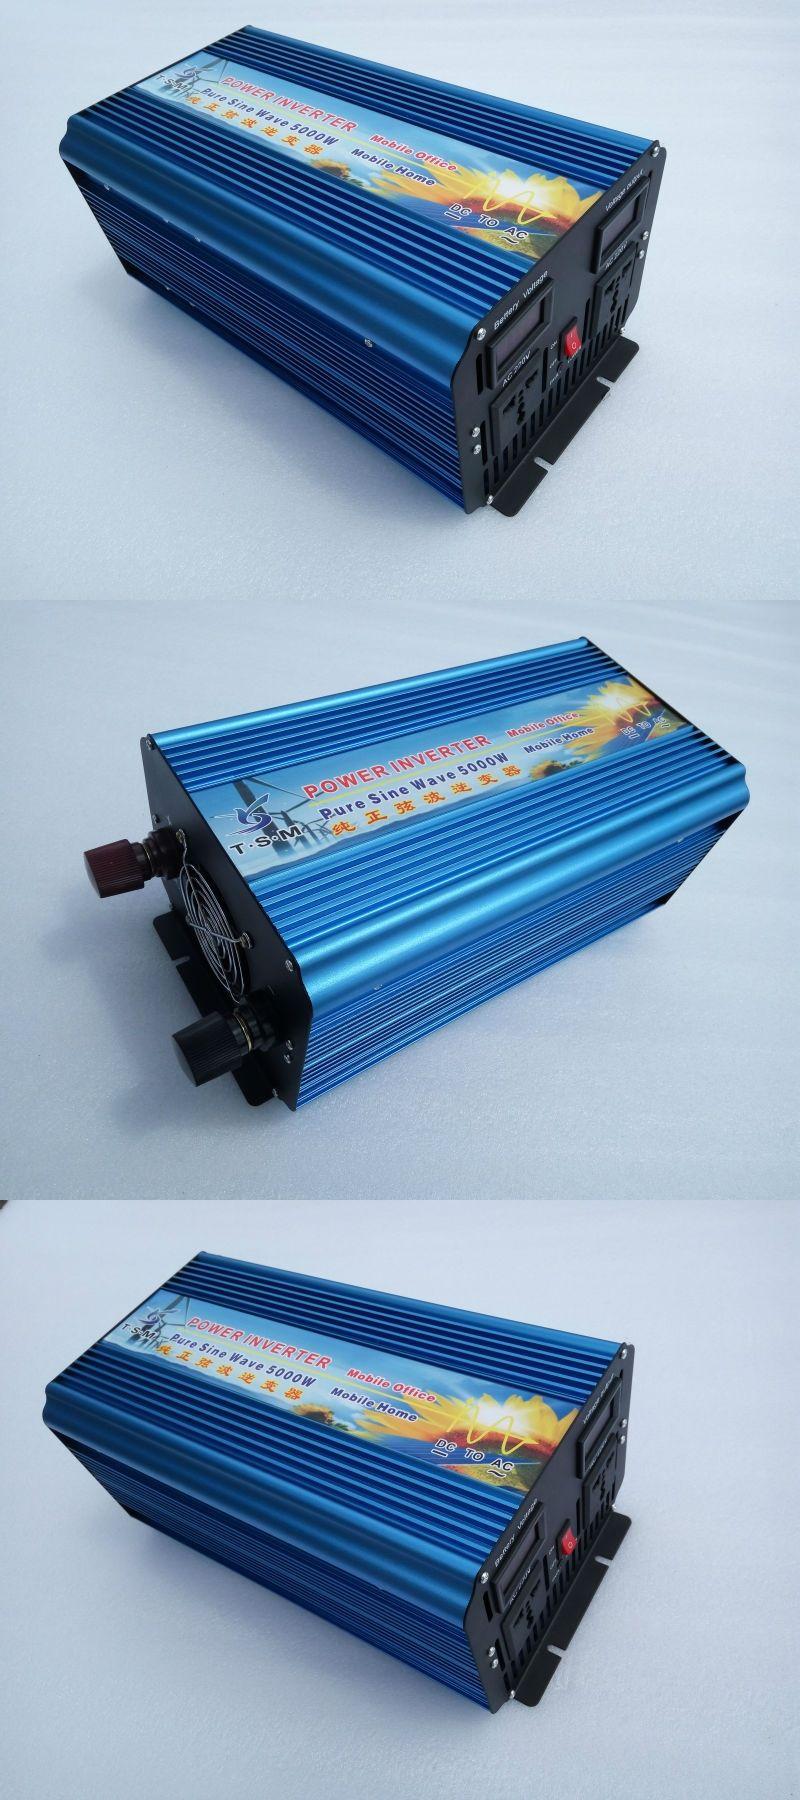 5000w10000w Peak Off Grid Inverter Pure Sine Wave Solar Dc Ac On 5000w 12 24 48v To 100 110 120 220 230 240v